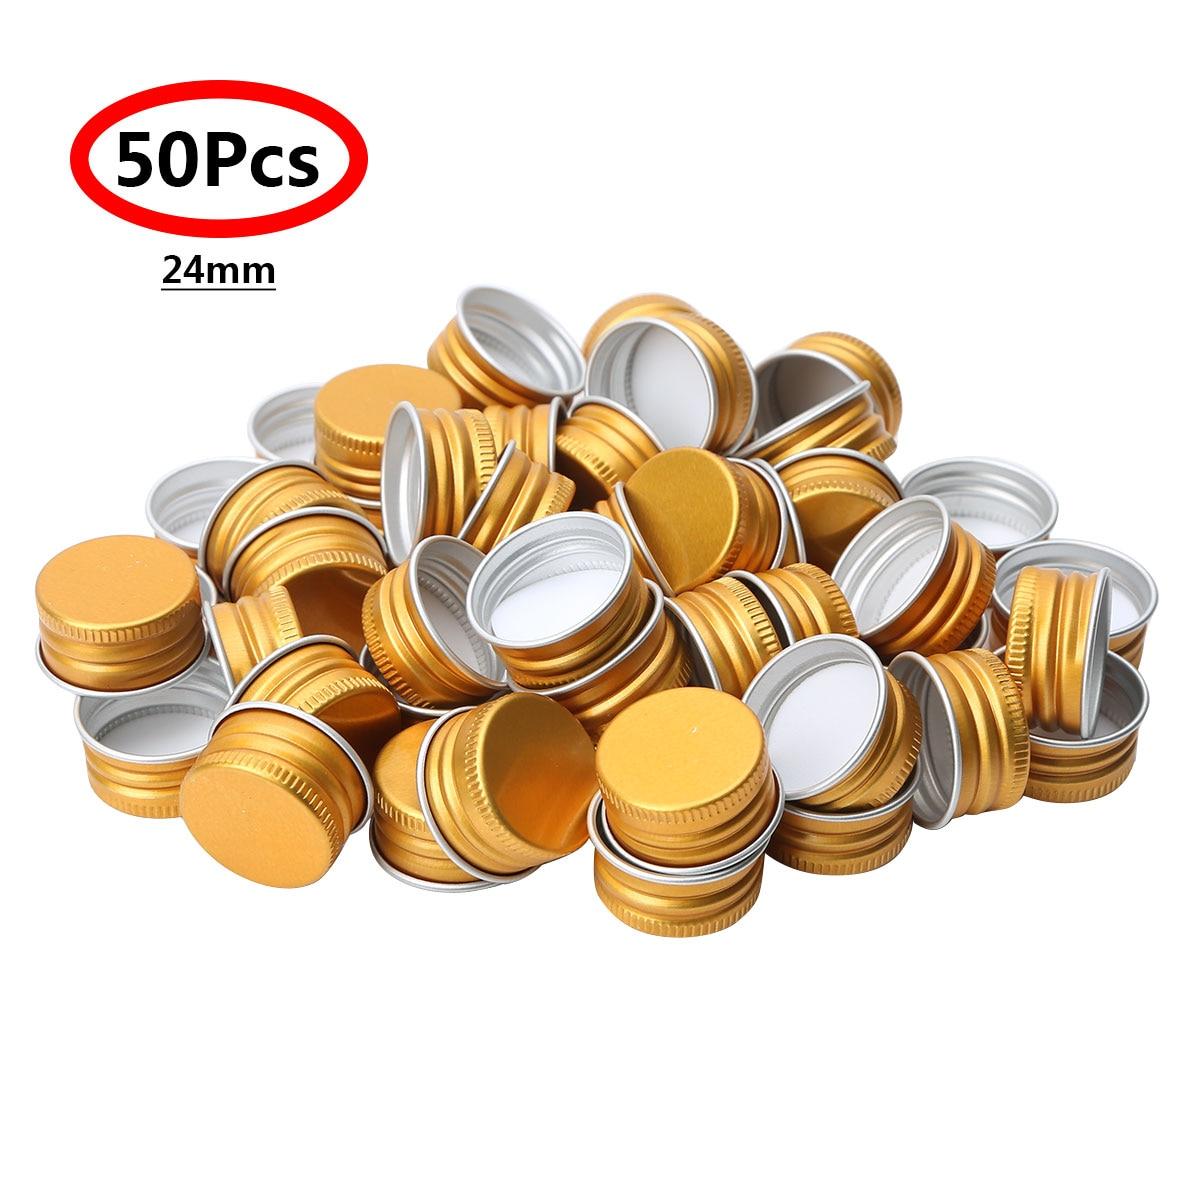 50Pcs Mini Small Caps Premium Aluminium Threaded Caps Lids Replacements for Mason Jar Borosilicate Glass Bottles